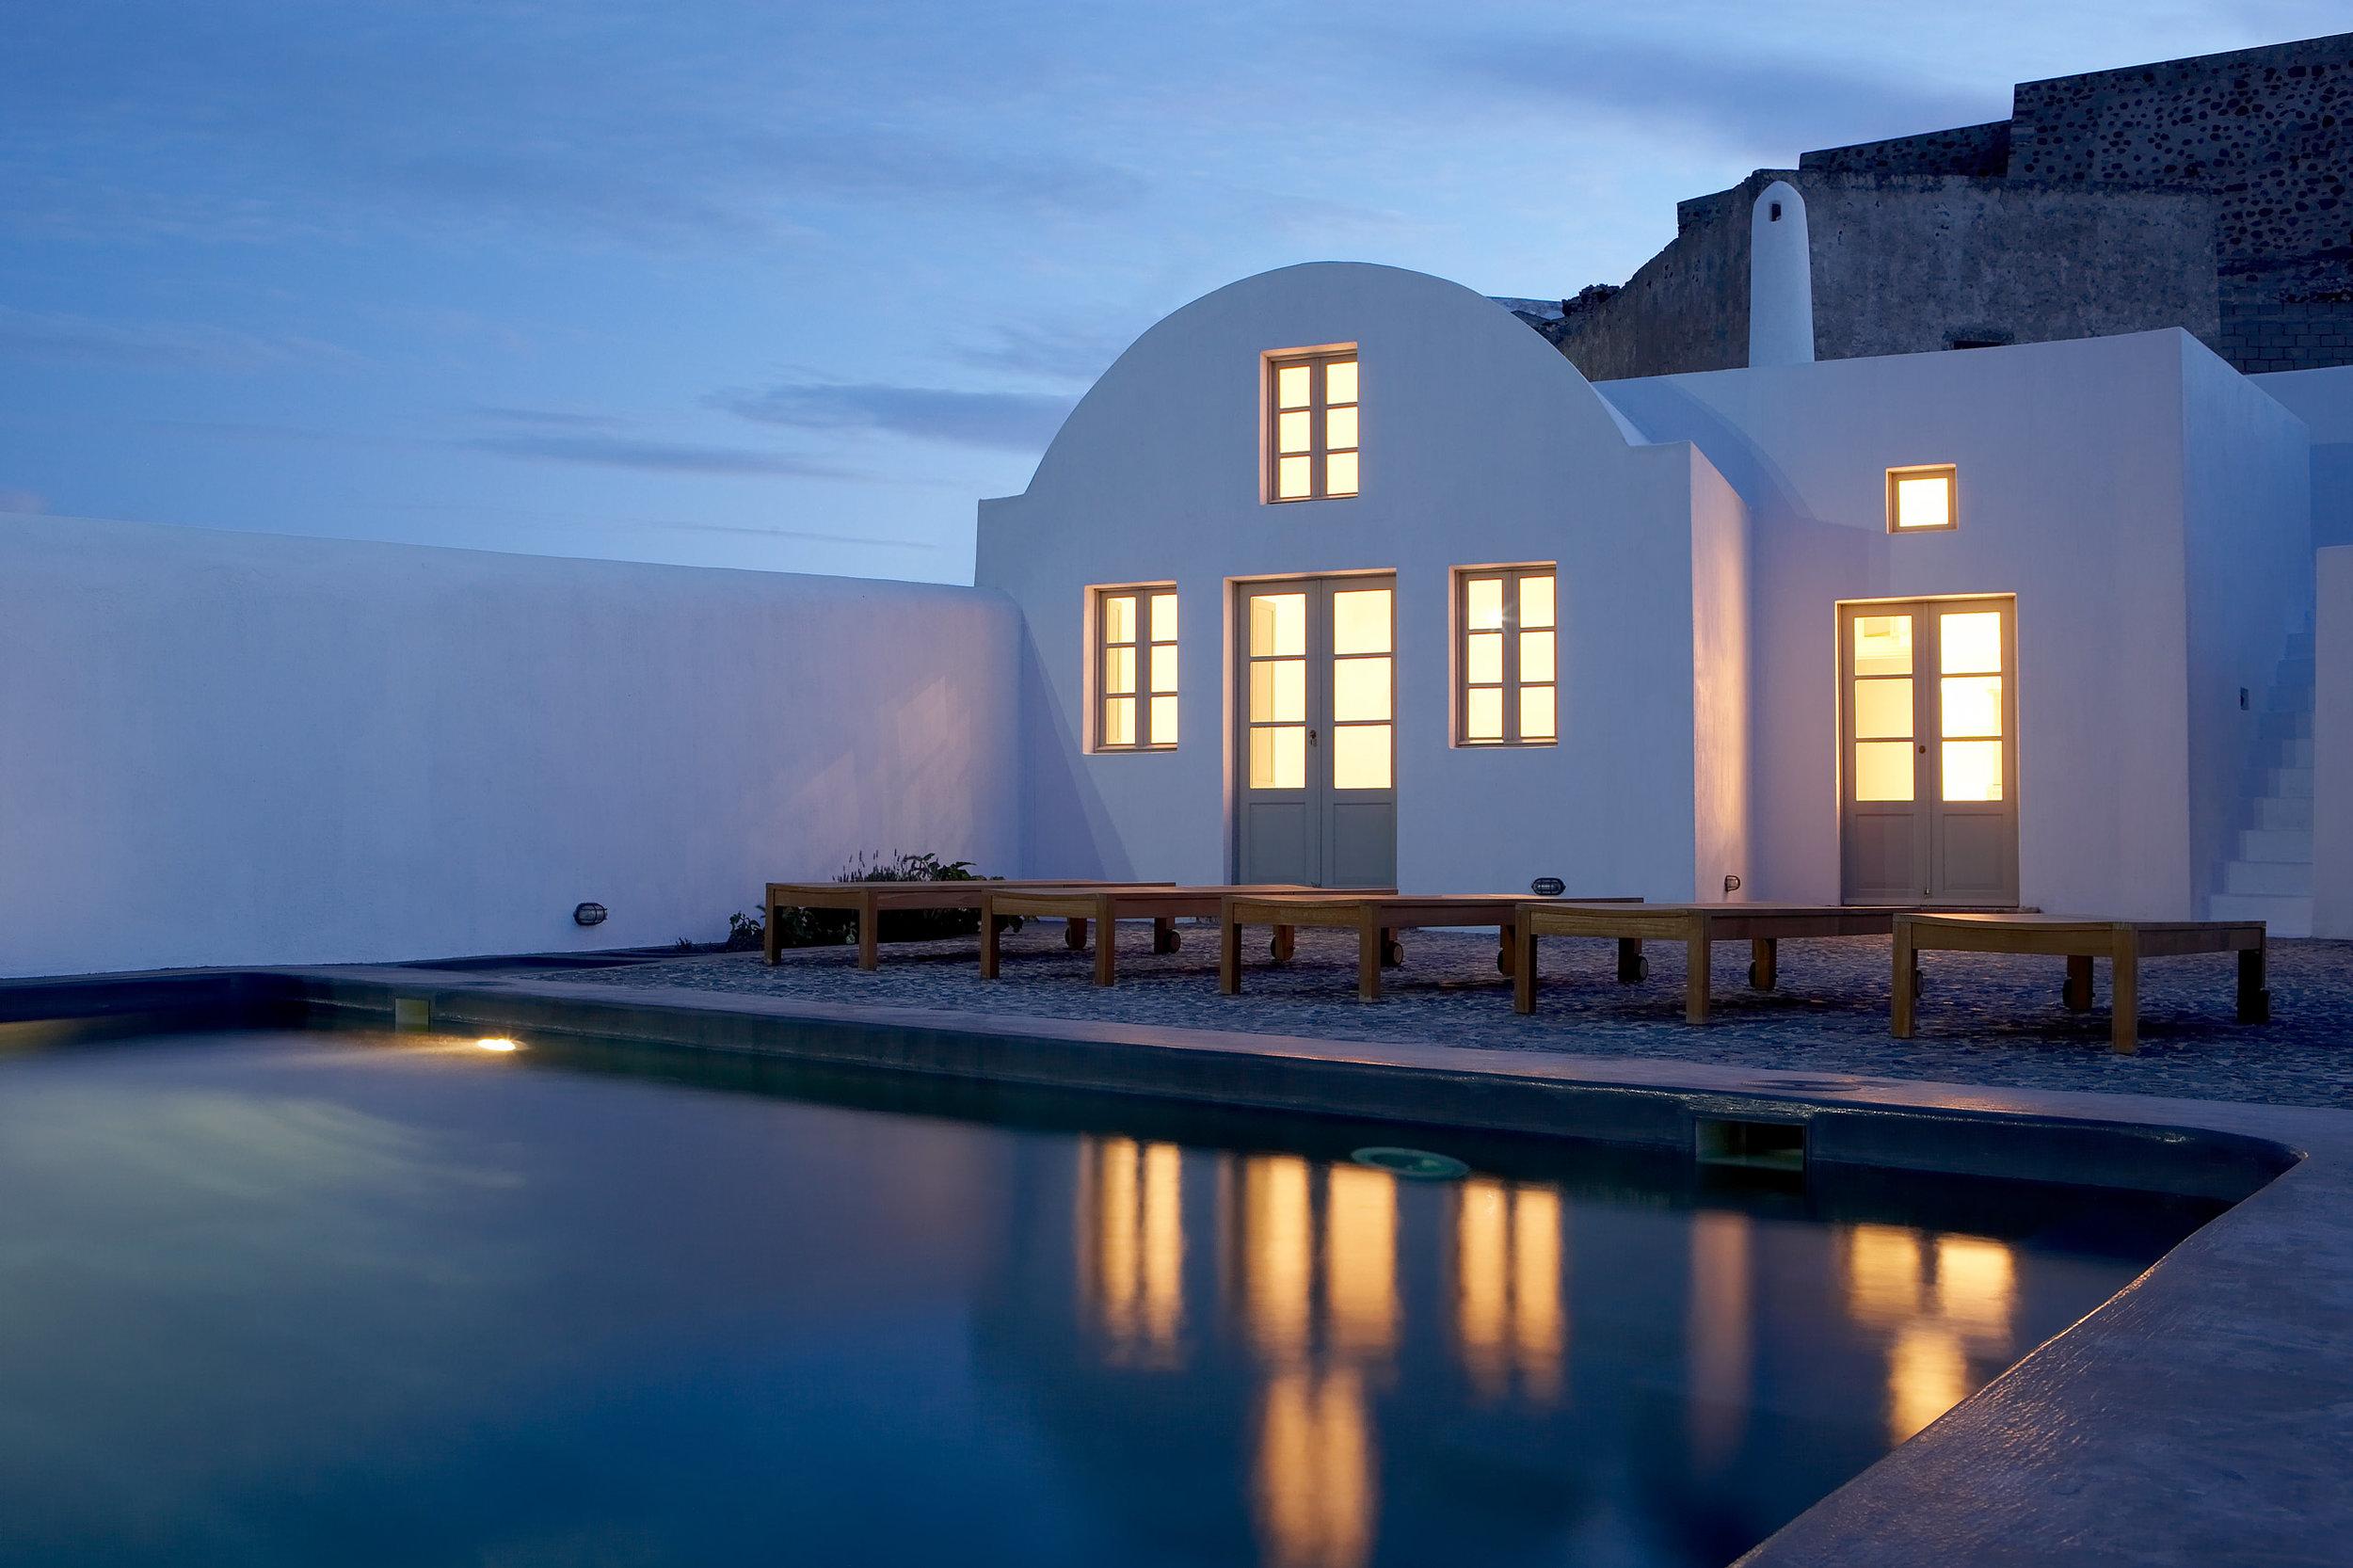 luxury-villa-santorini-greece-old-factory-loft-style-leisure-pool-public-dining-dusk.jpg